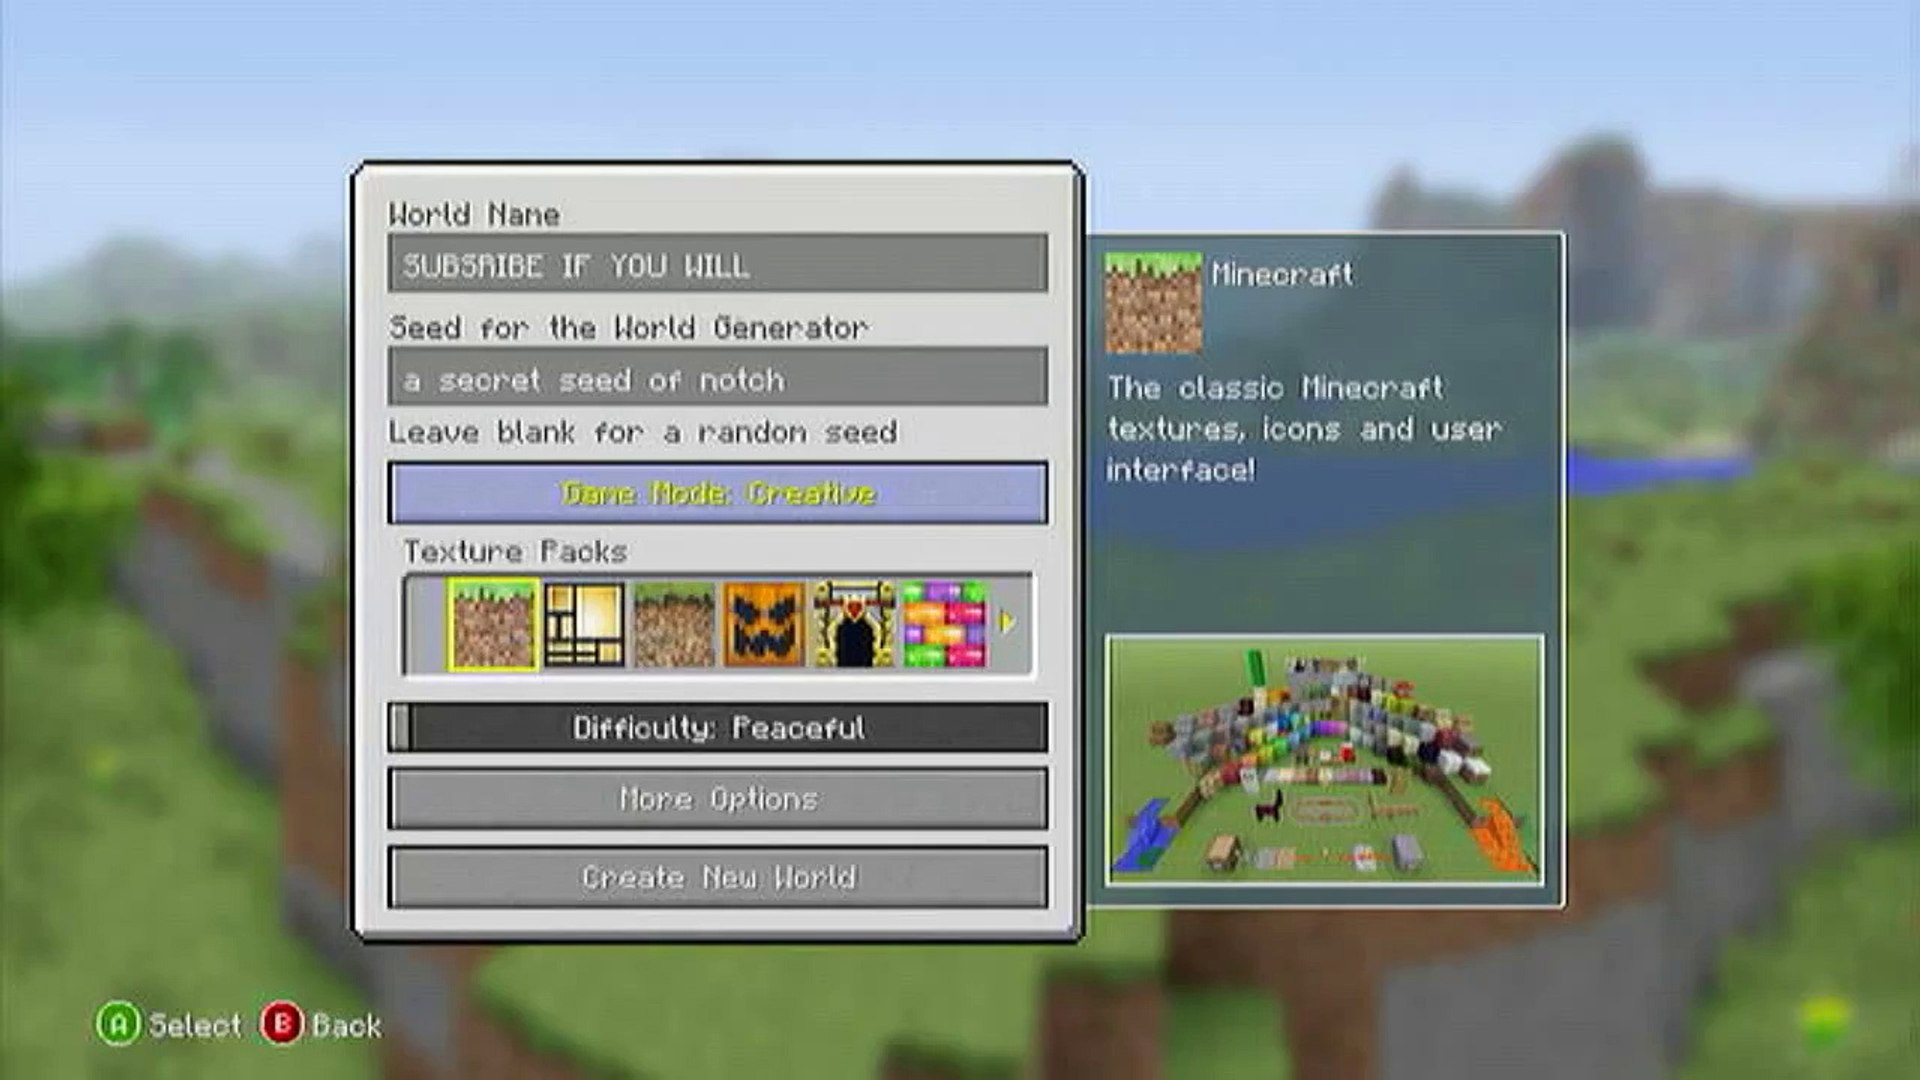 Minecraft (Xbox11/Ps11) - (TU211) Seed - ( a secret seed of notch